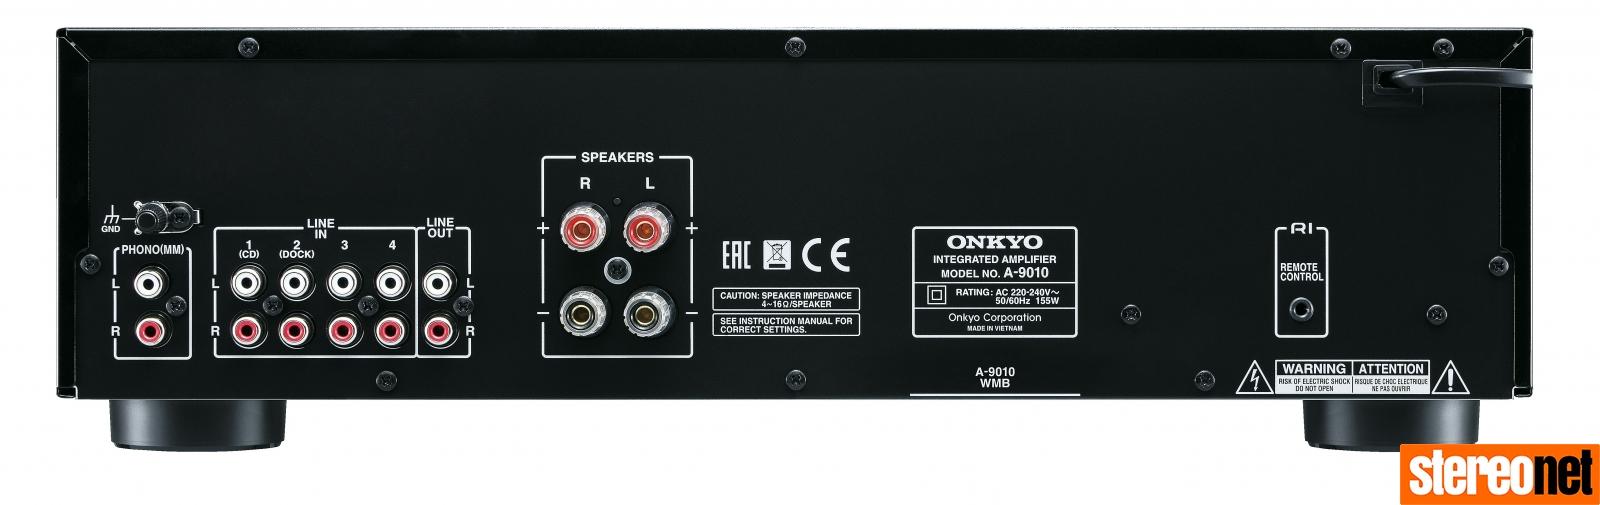 Onkyo A-9010 UK review